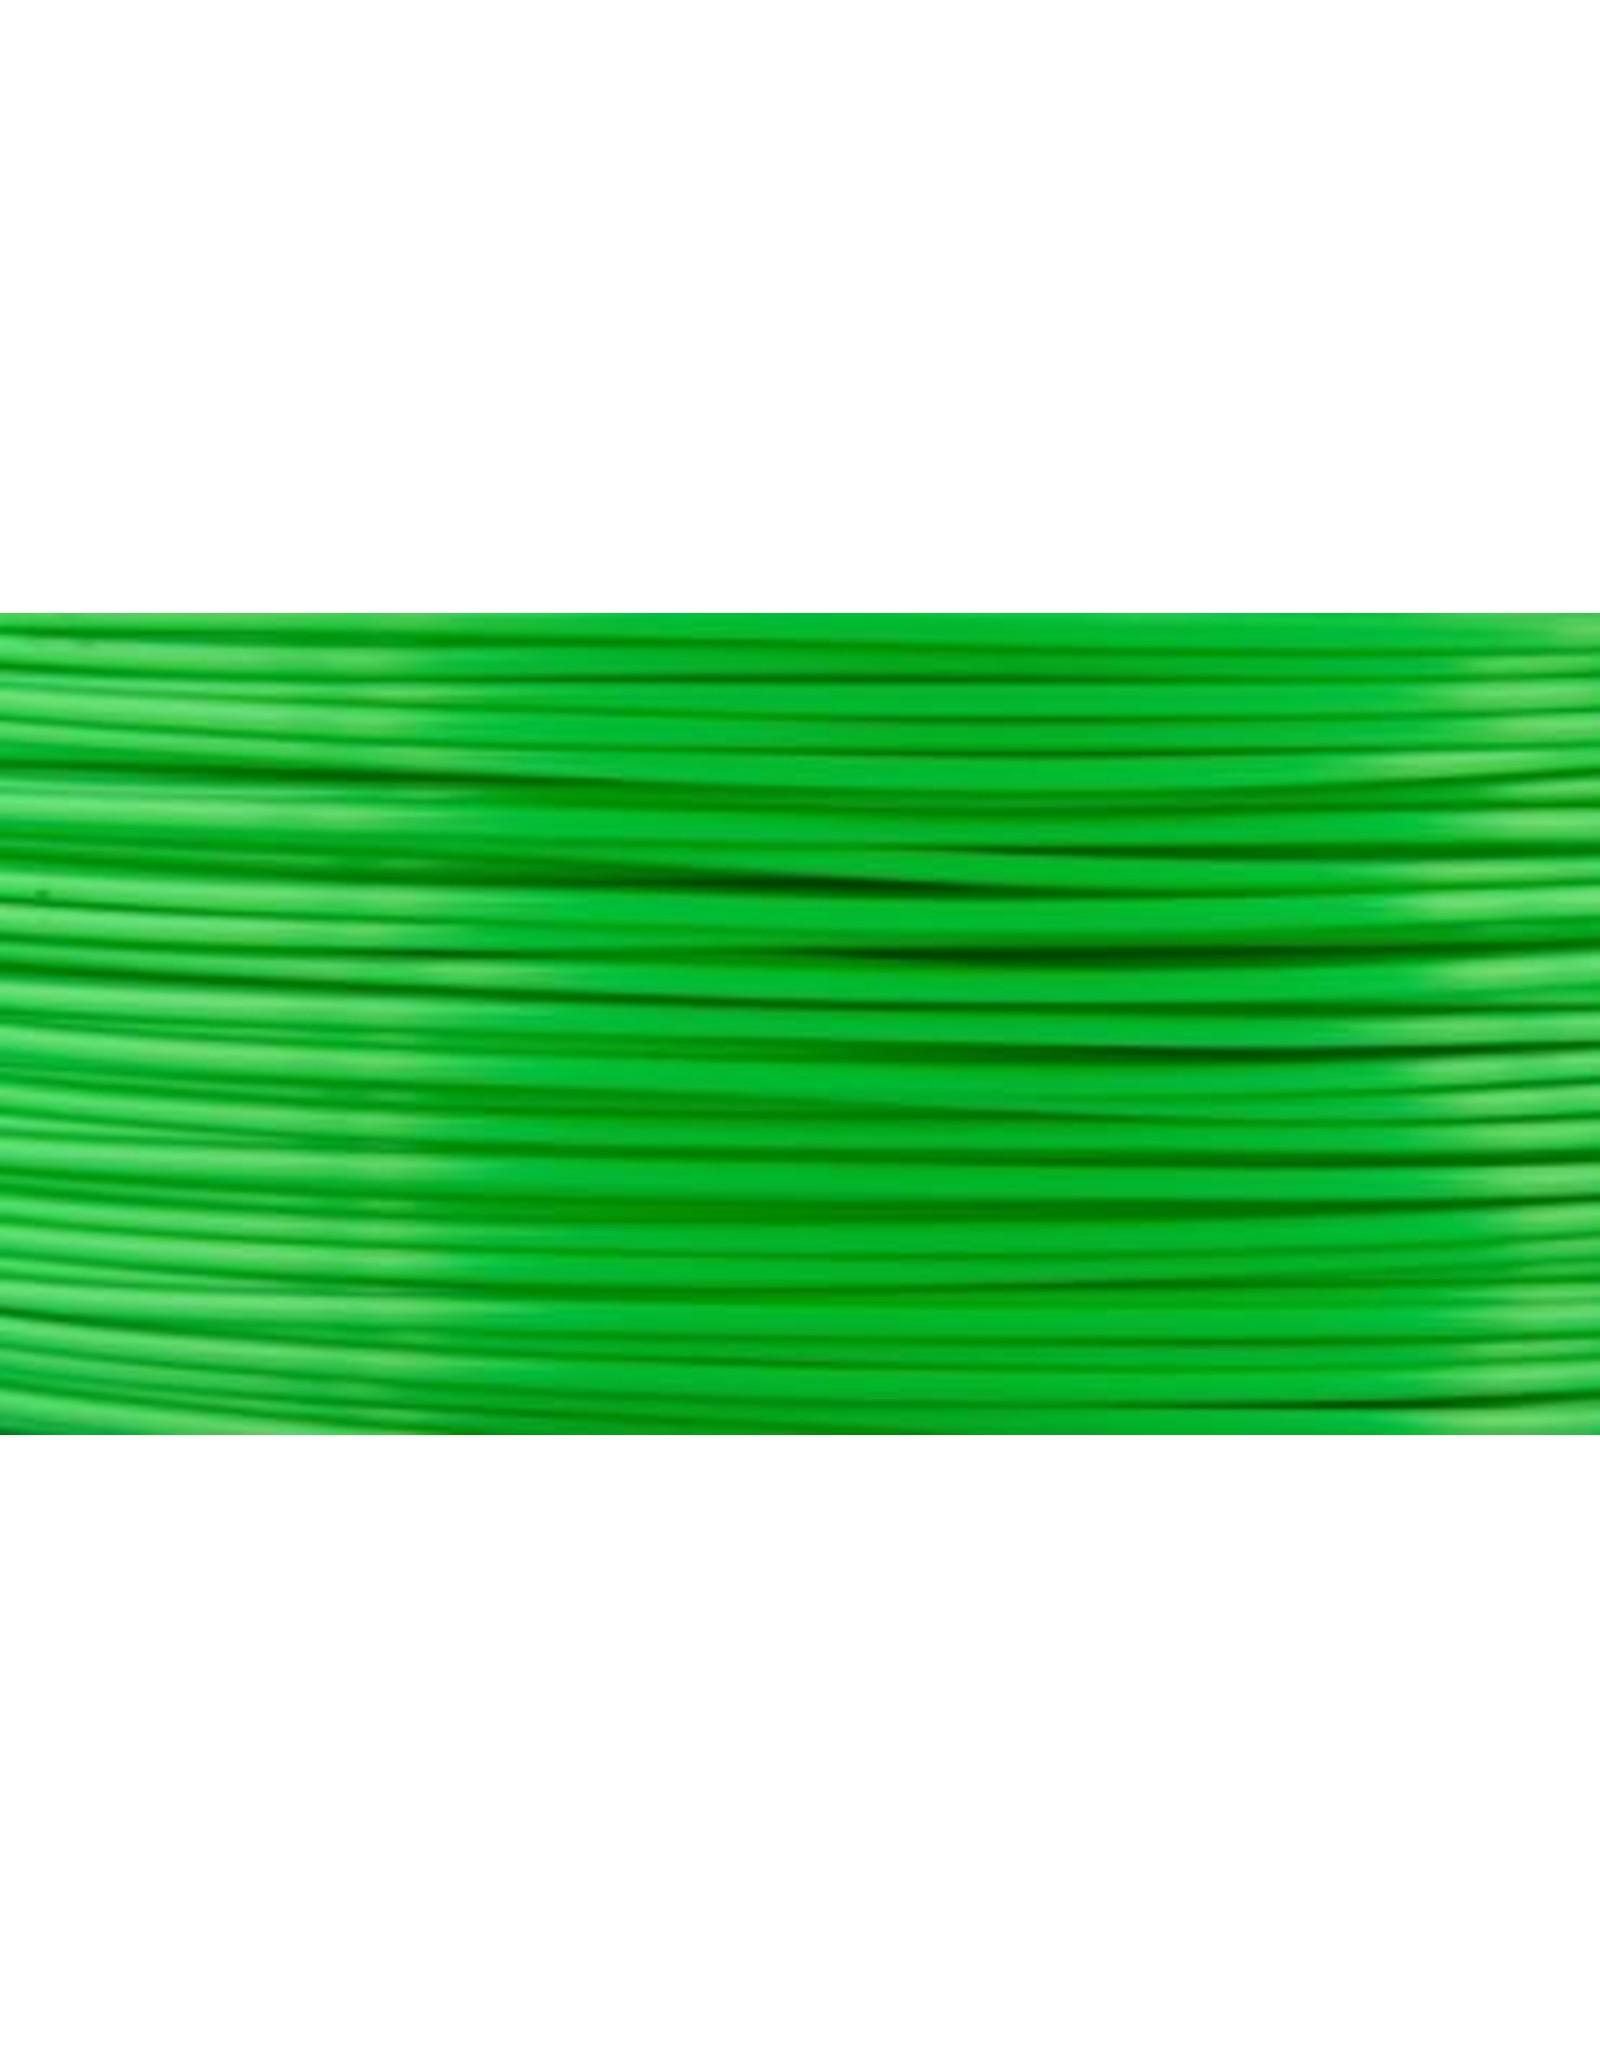 Prima PrimaSelect PLA Satin  1.75mm - 750gr Light green